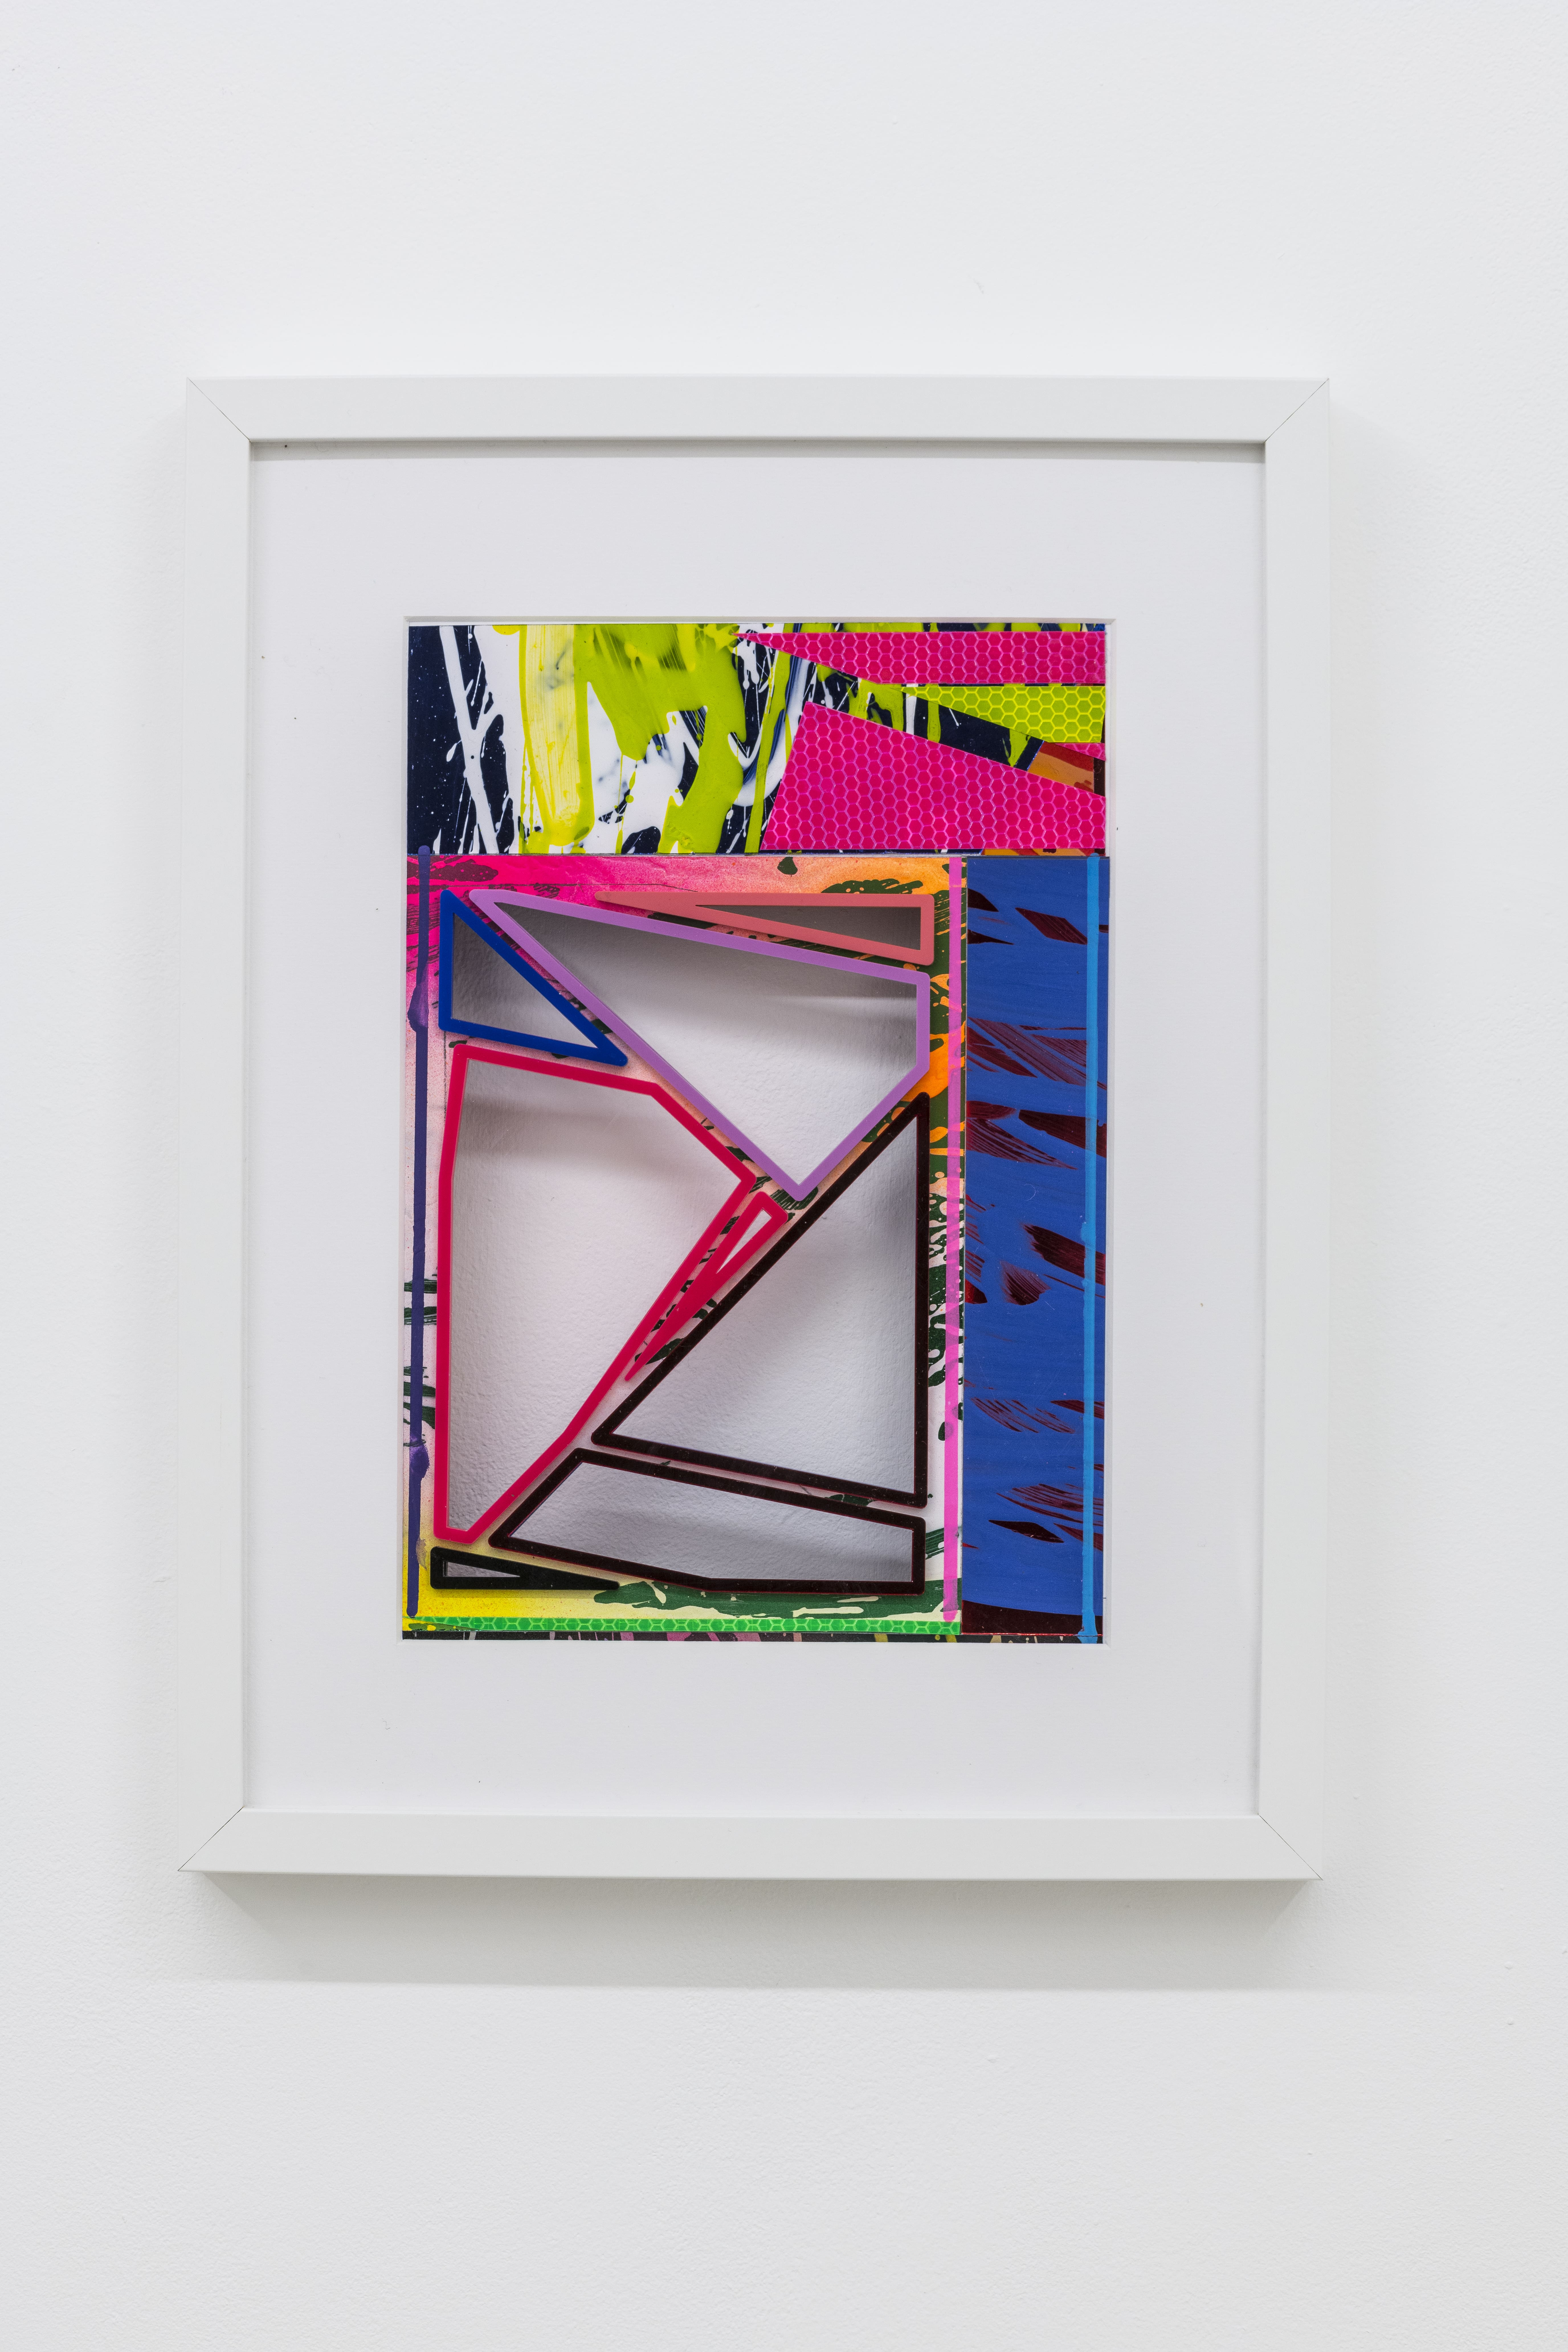 NemesM_Tomorrow-11_2018_40x30cm_lasercut-perspex-acrilyc-light-reflective-vinyl-mirror-board-min